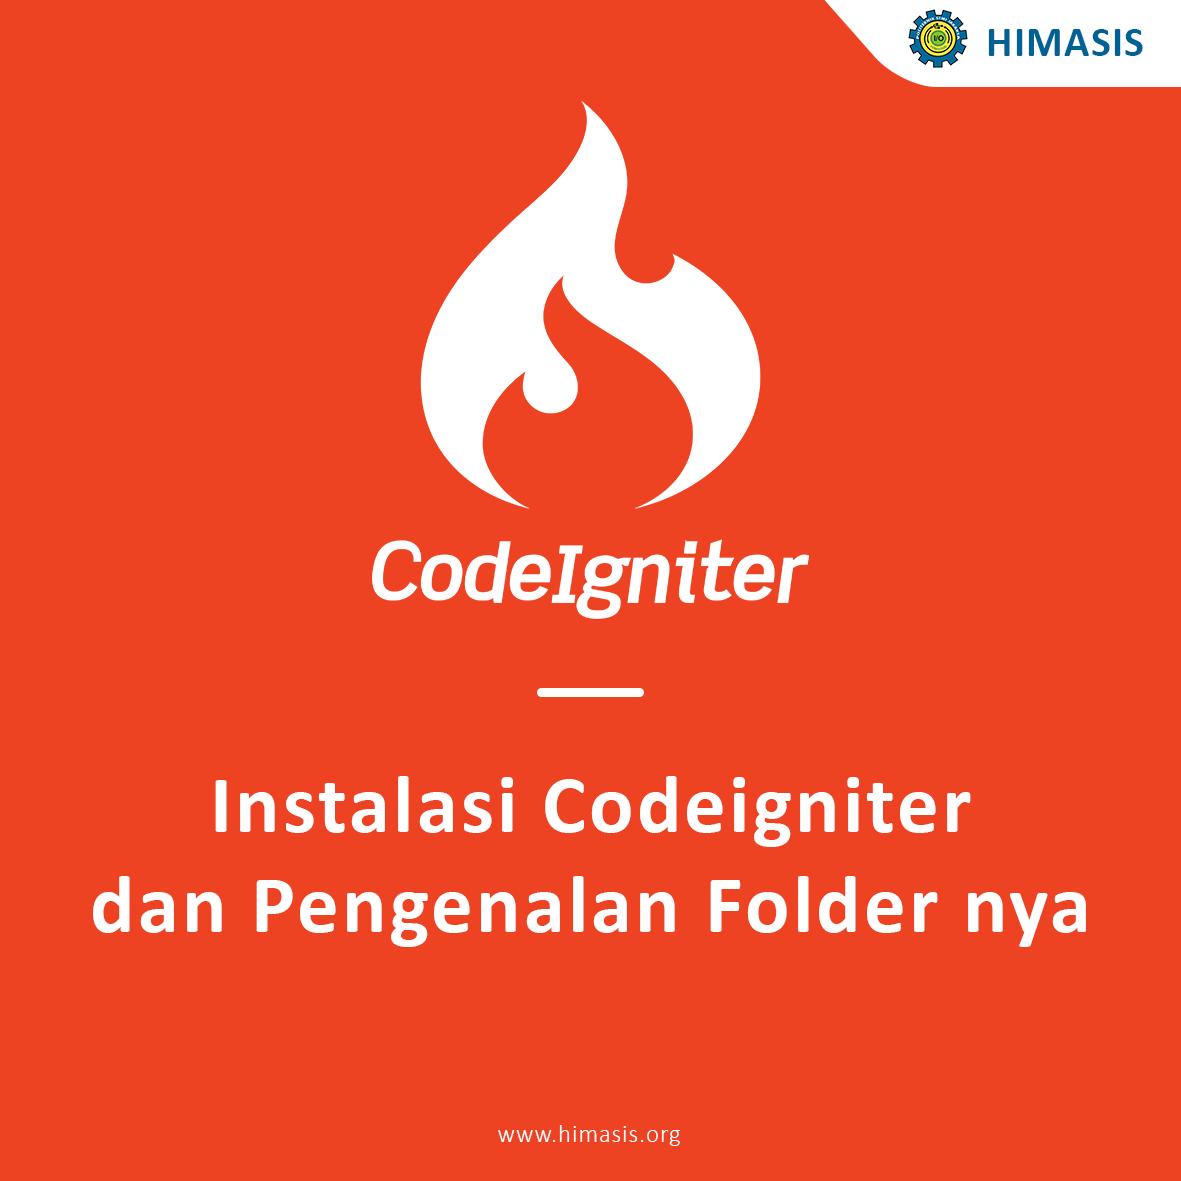 Instalasi Codeigniter dan Pengenalan Folder nya